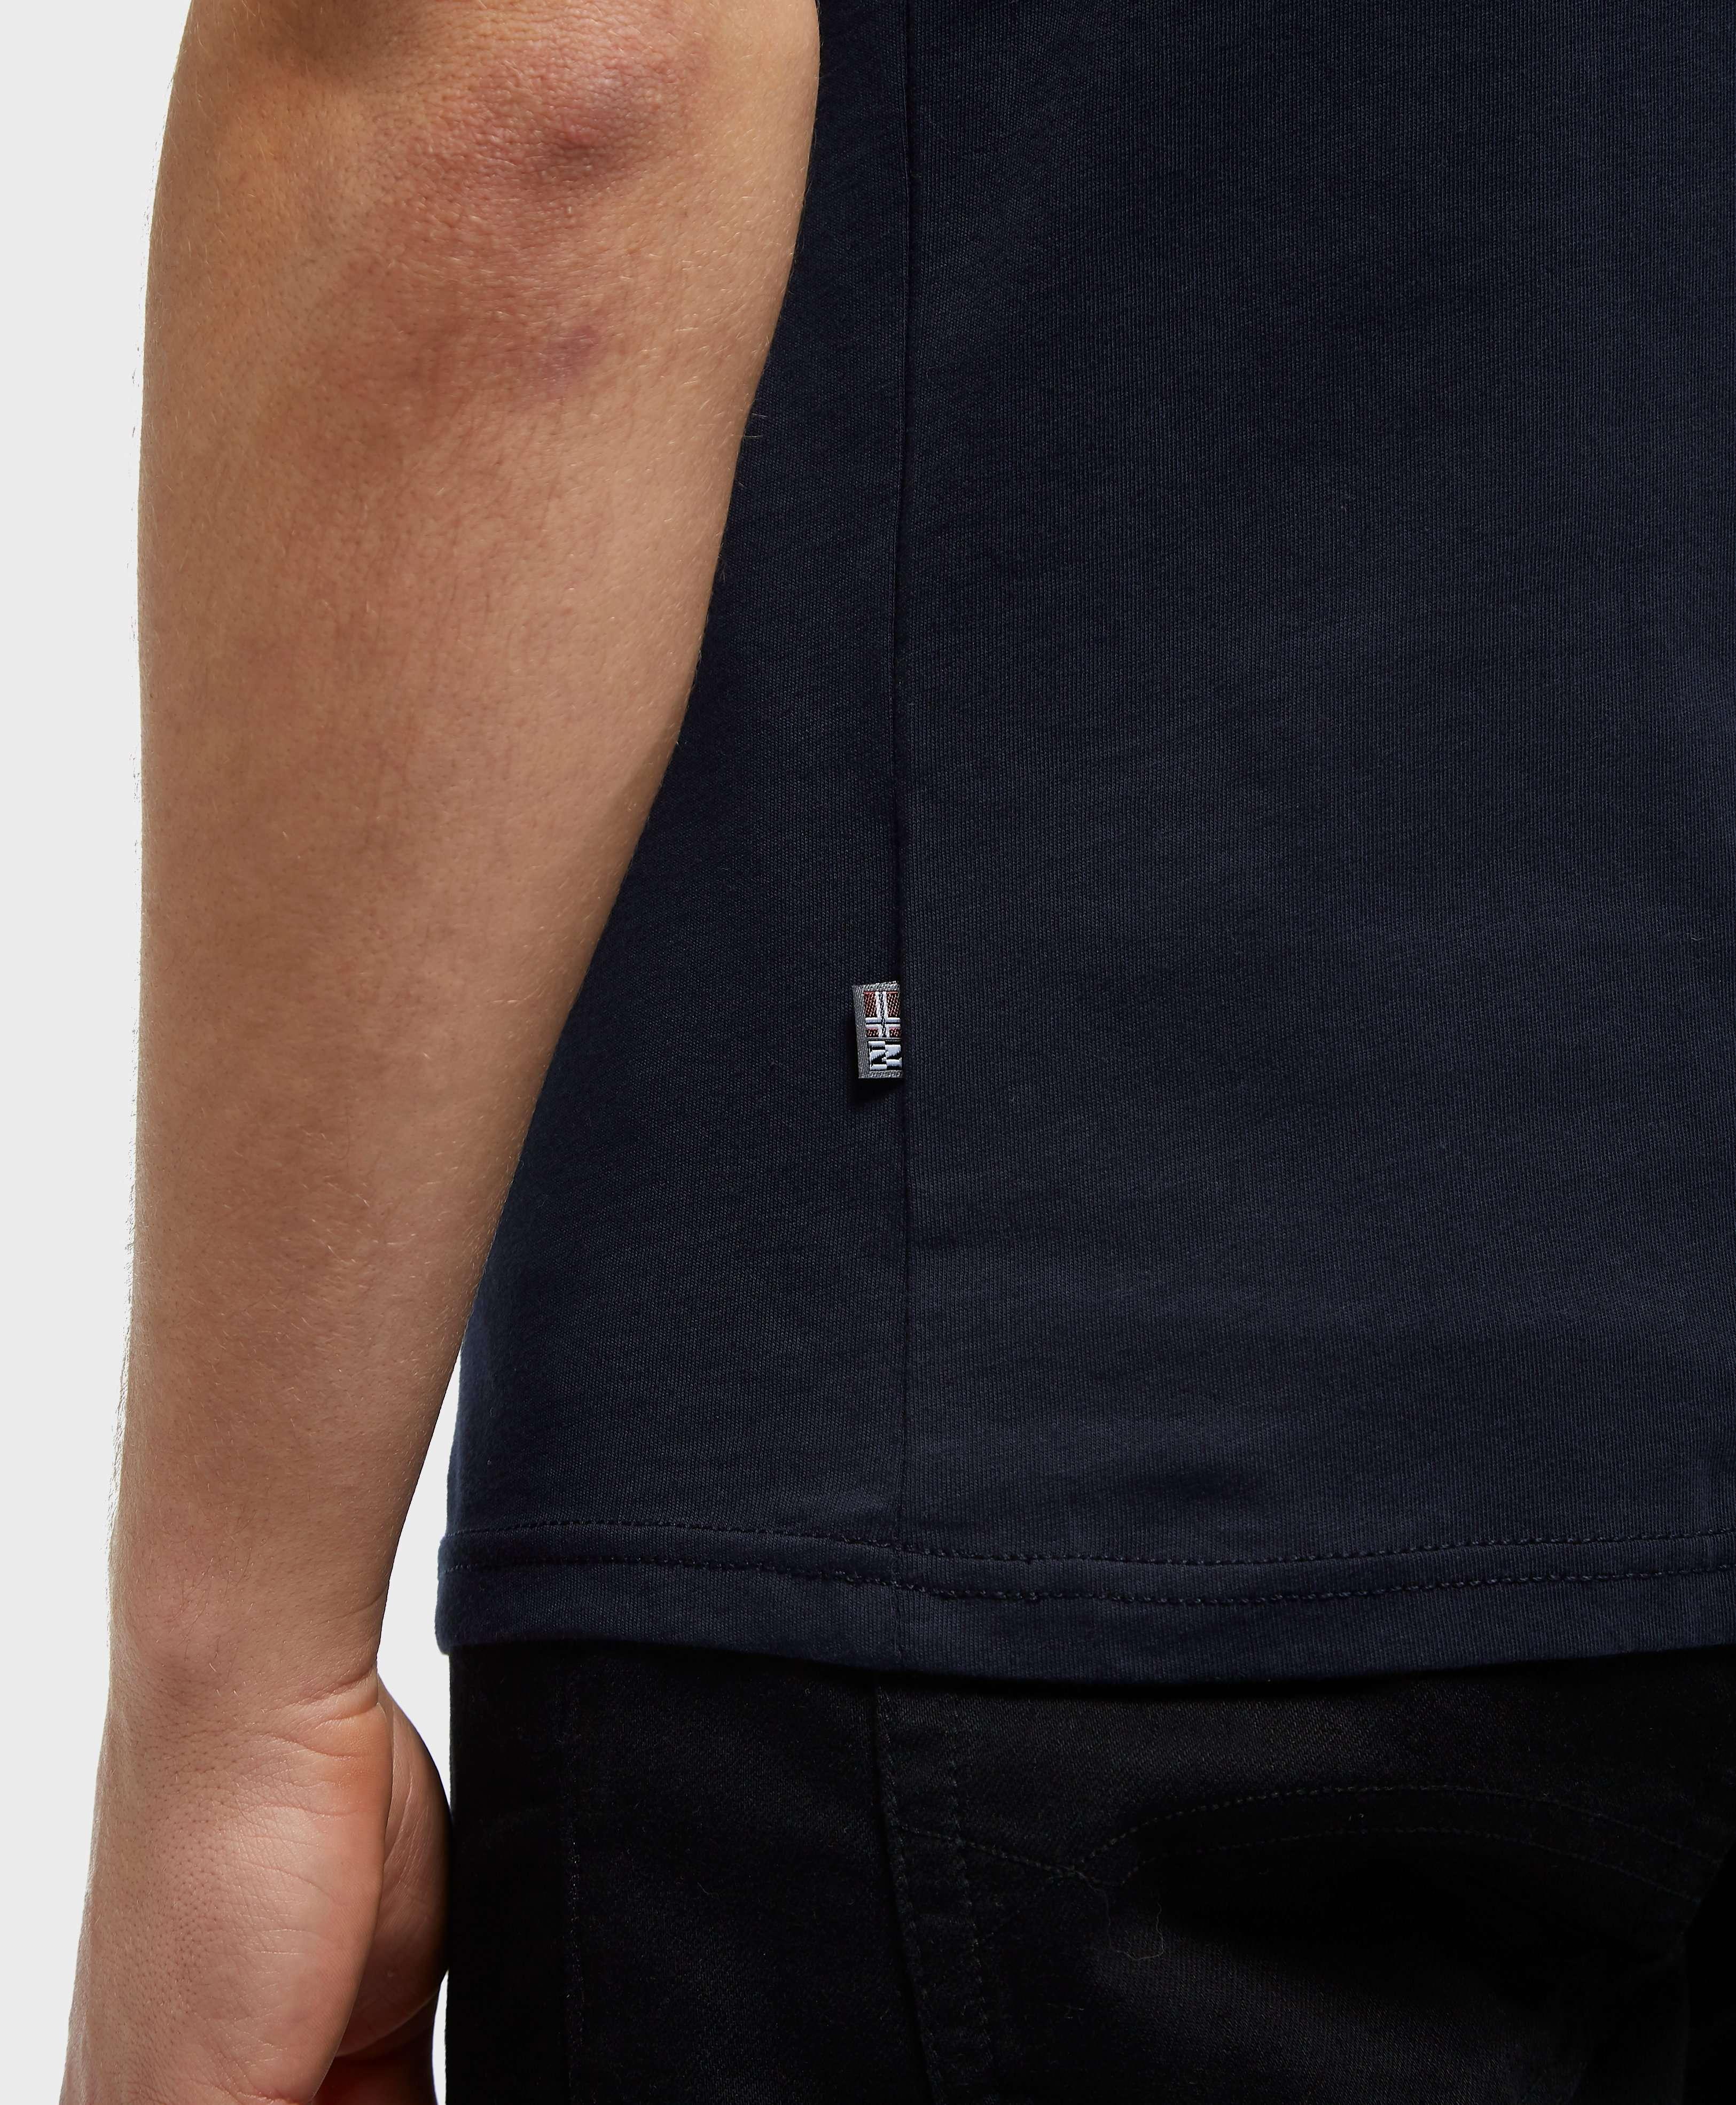 Napapijri Small Flag Short Sleeve T-Shirt - Online Exclusive